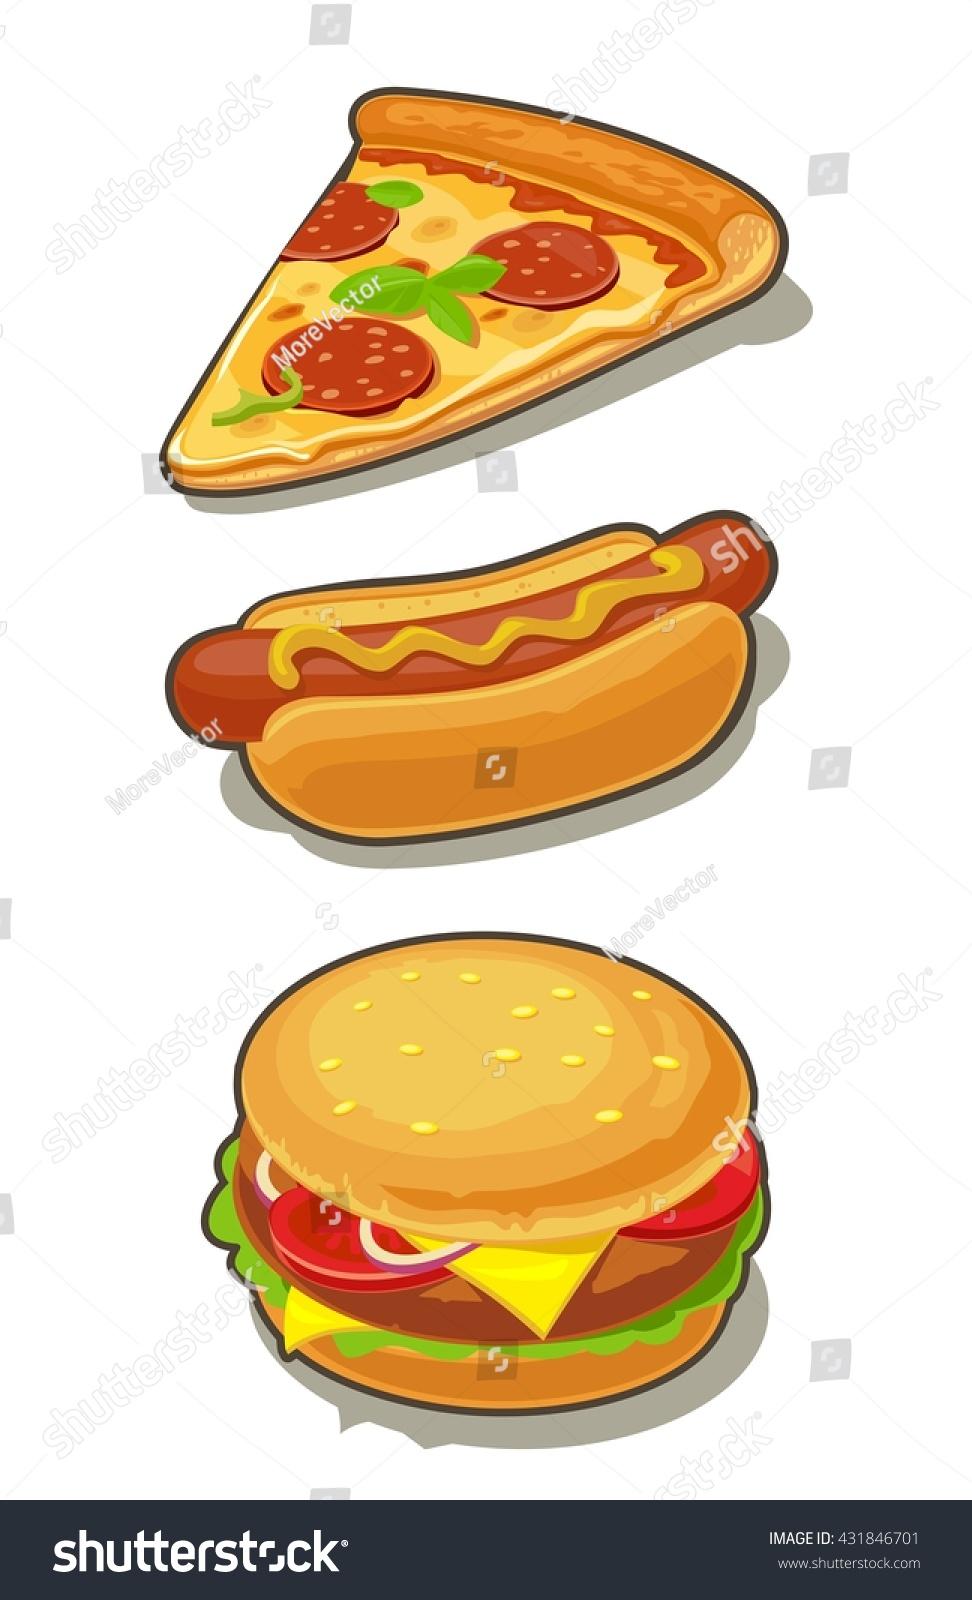 Cartoon Pic Of Hot Dog